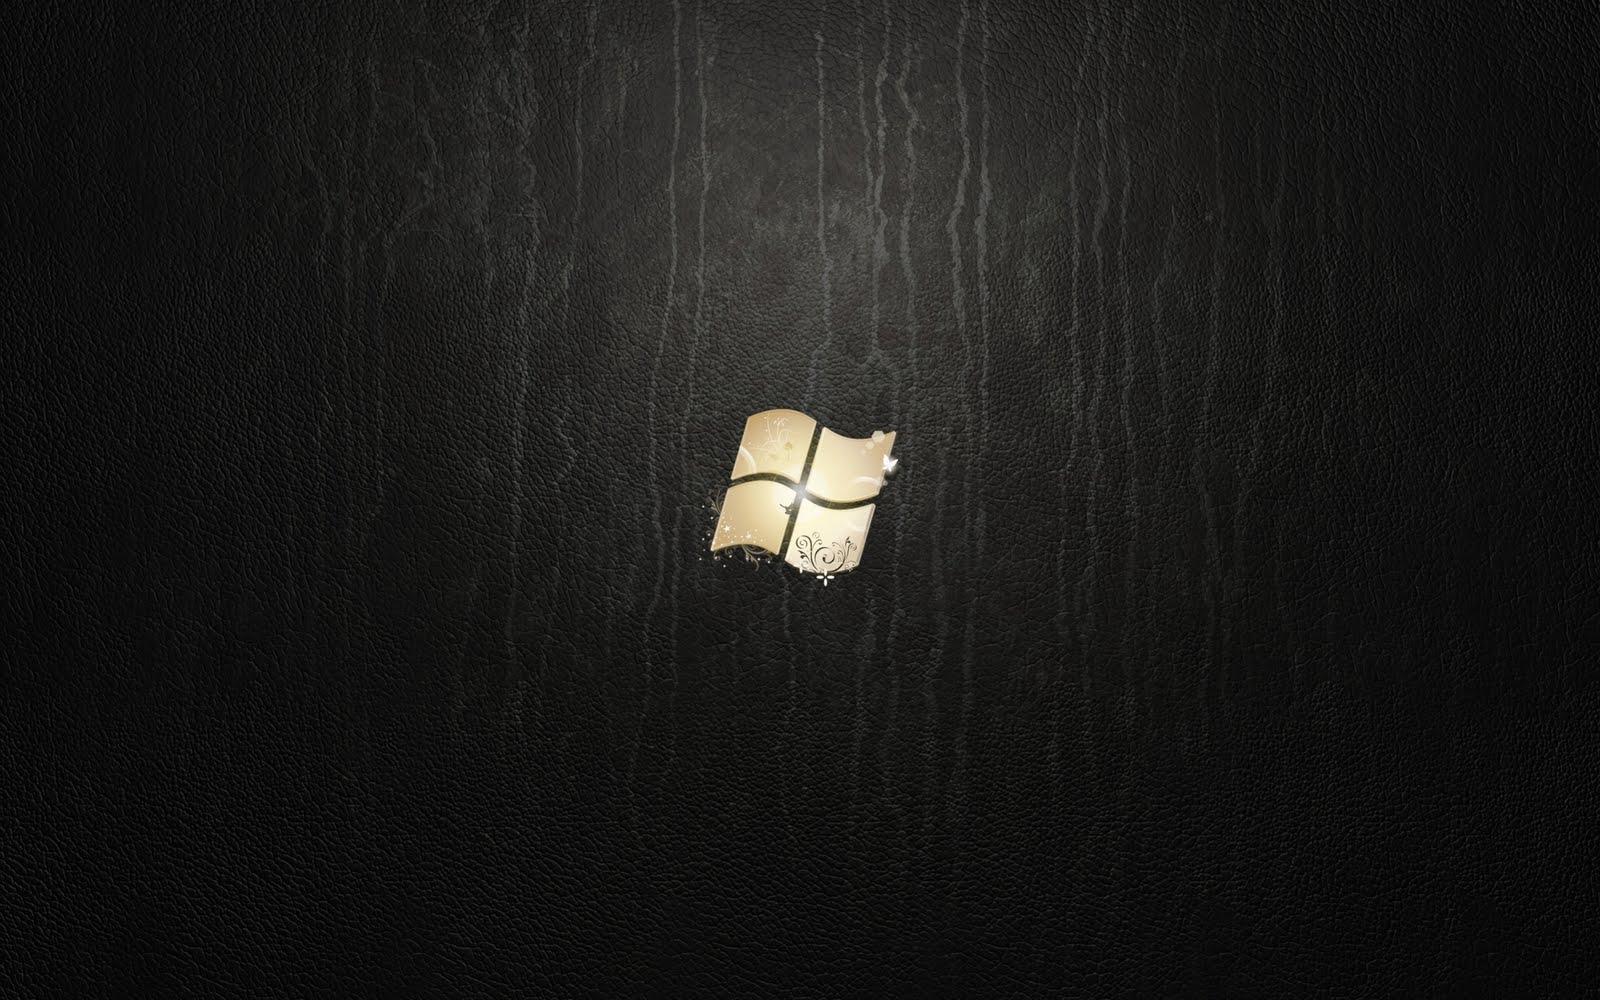 http://2.bp.blogspot.com/-hR-KuaHlfd8/T5m0Jm2uz3I/AAAAAAAAFDc/xT1pxU-gWtE/s1600/windows7+-+hd+black+wallpapers+-+wood+backgrounds.jpg